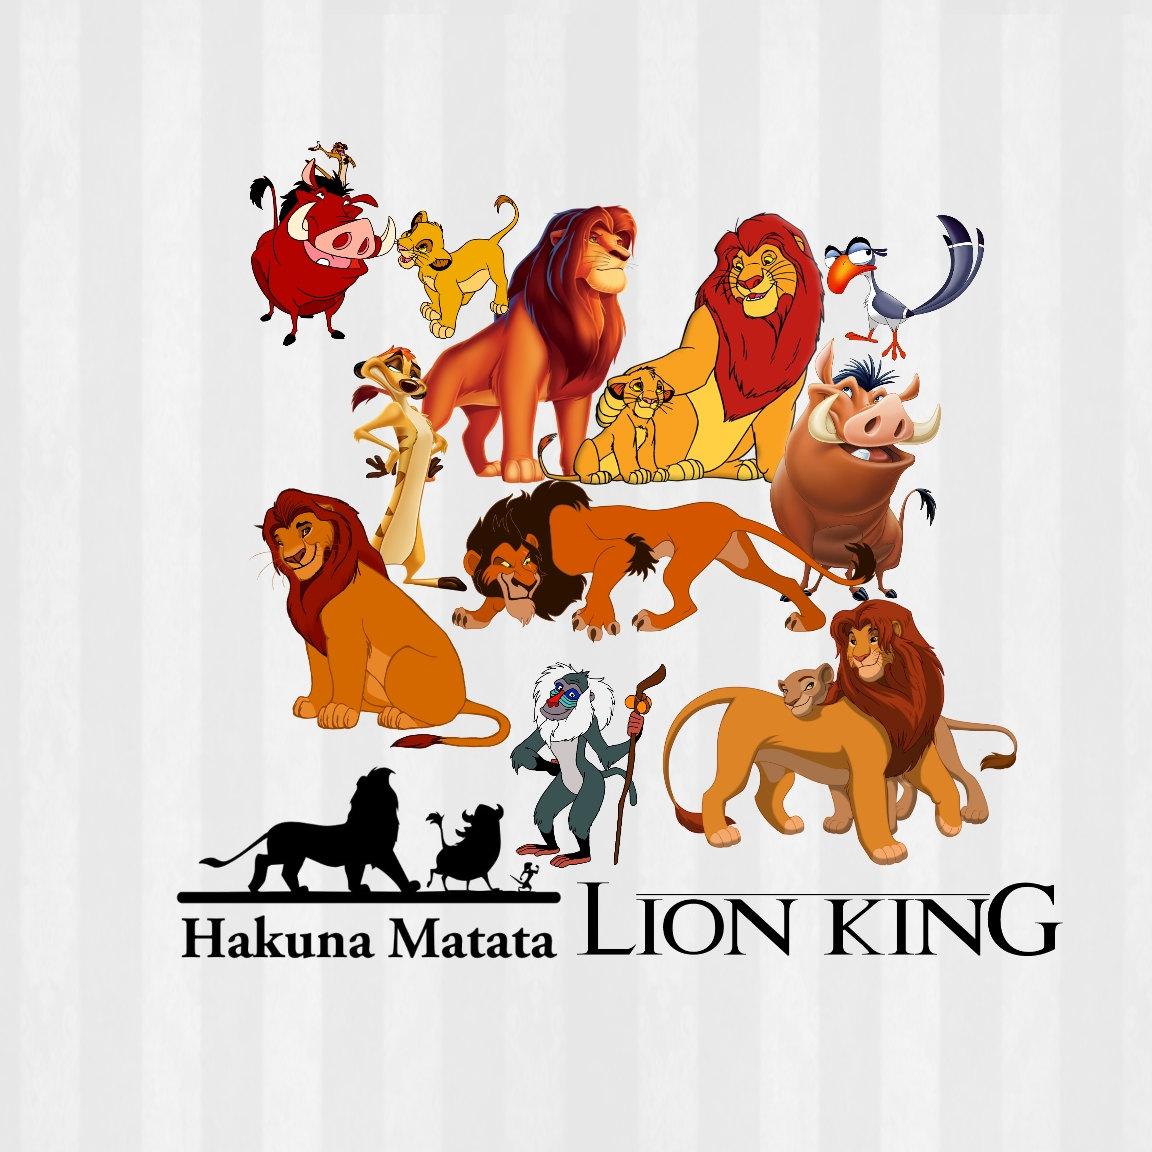 Mufasa clipart nala > 1152 King Lion King